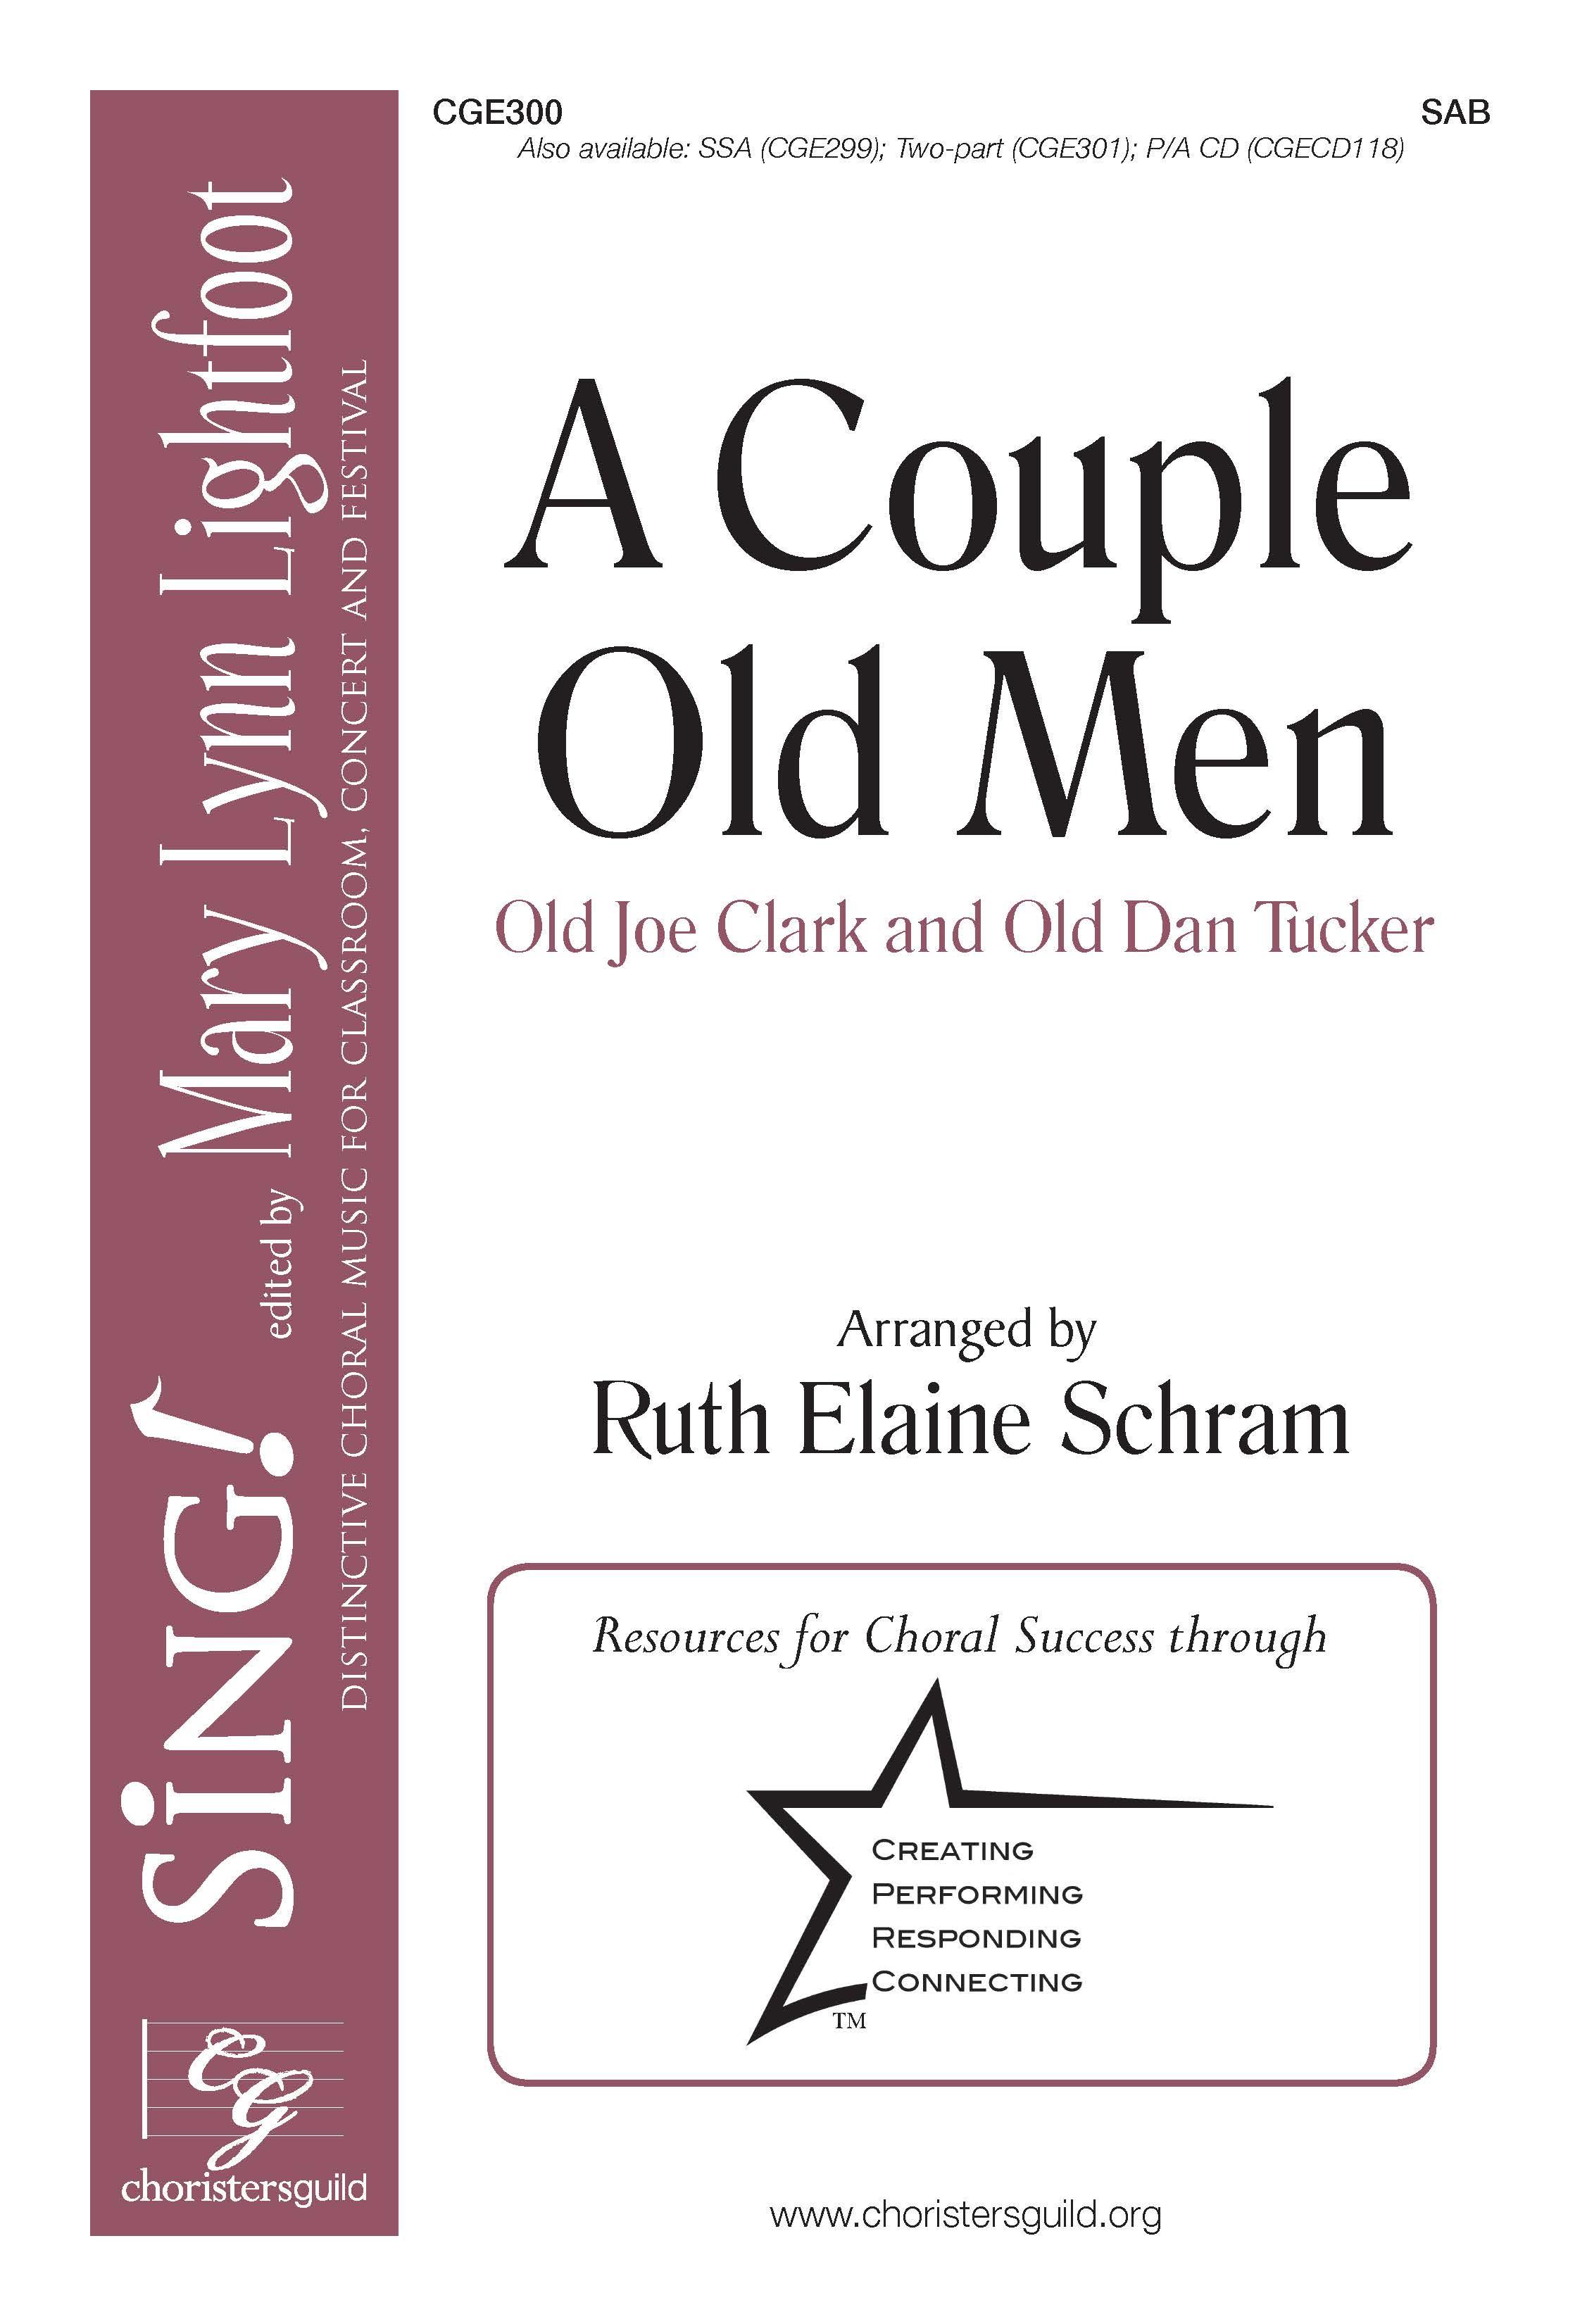 A Couple Old Men - SAB